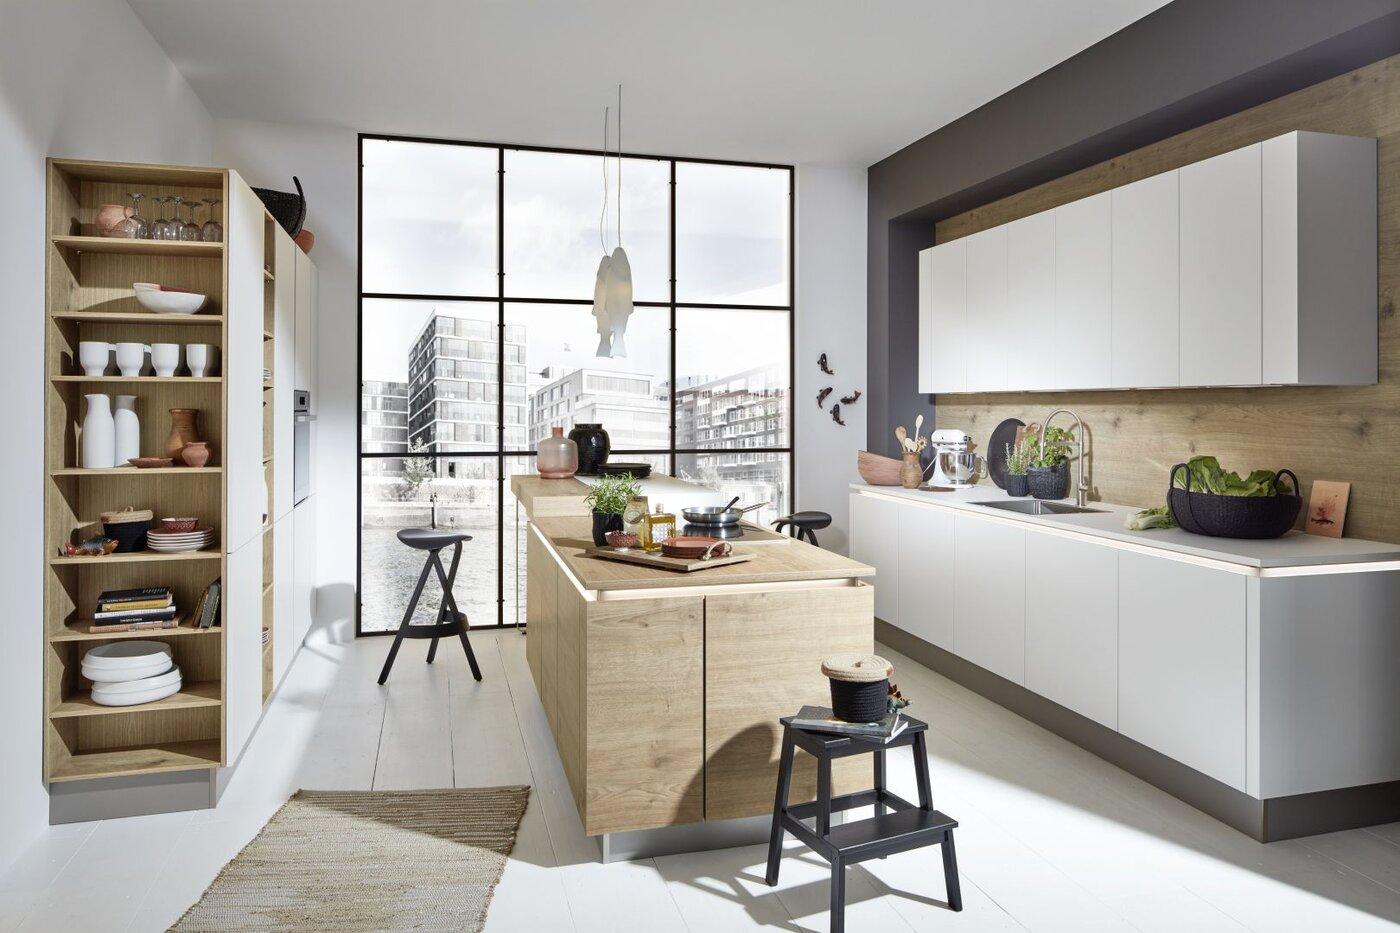 Moderne keuken eik met greeploze kastelementen